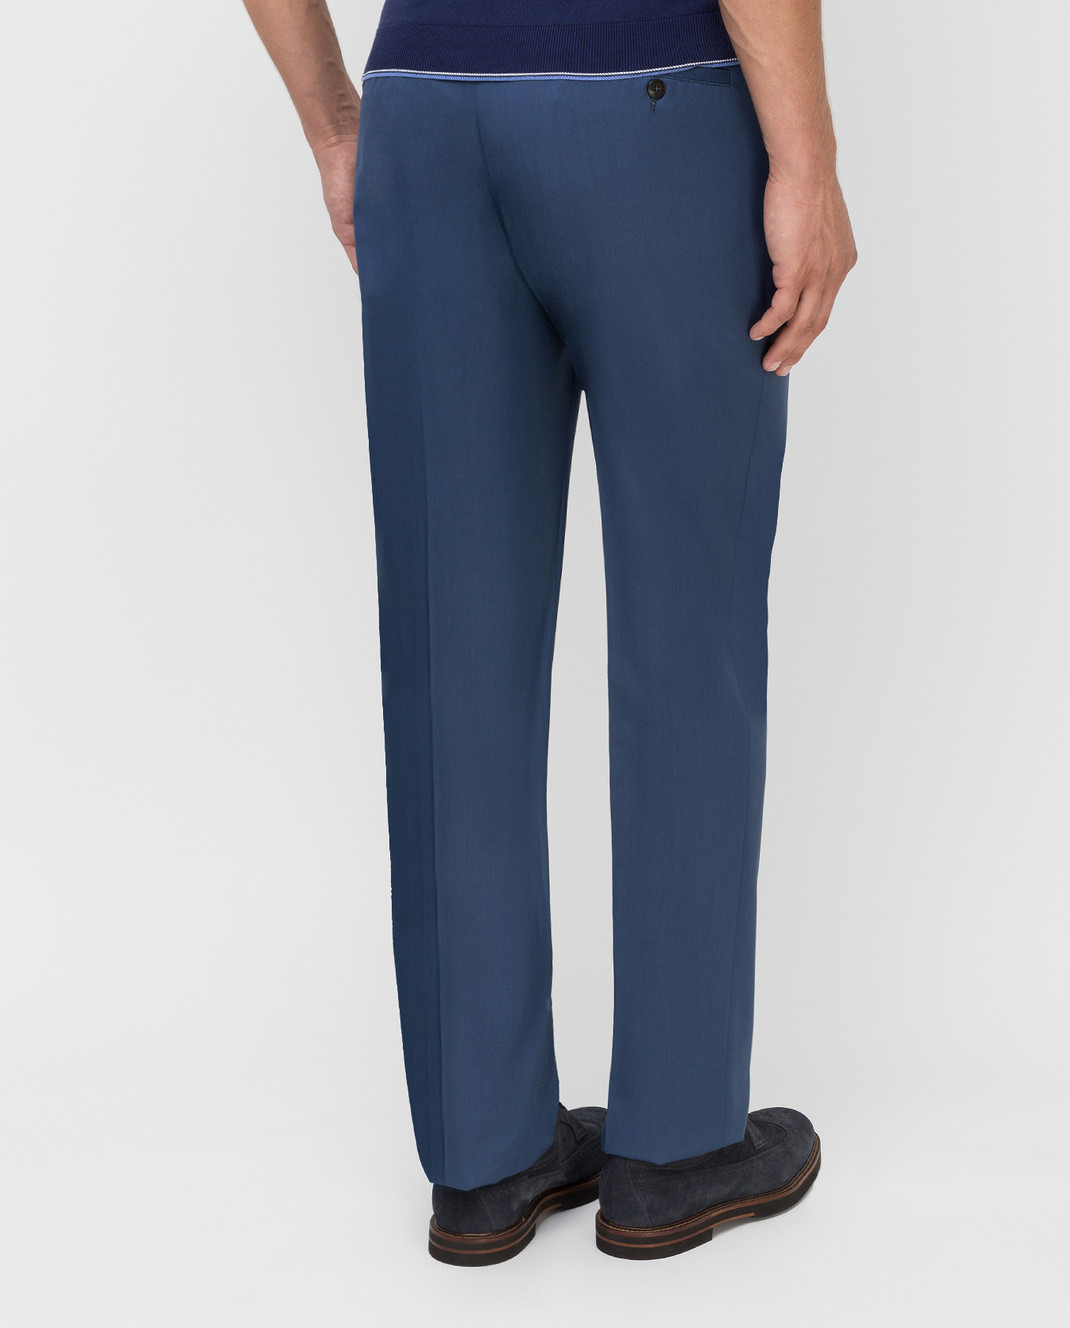 Castello d'Oro Синие брюки изображение 4